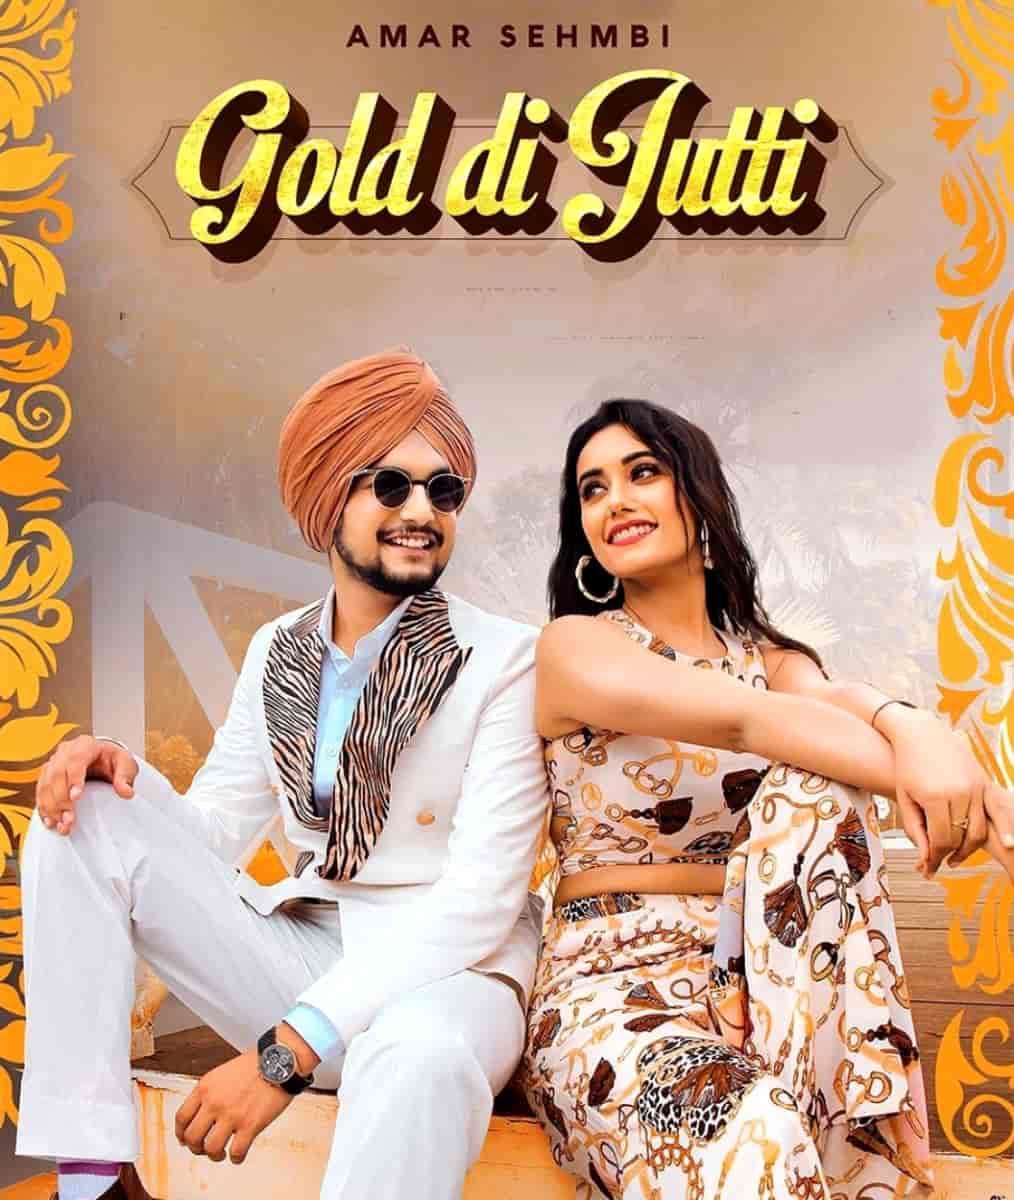 Gold Di Jutti Punjabi Song Image Features Amar Sehmbi and Charvi Dutta